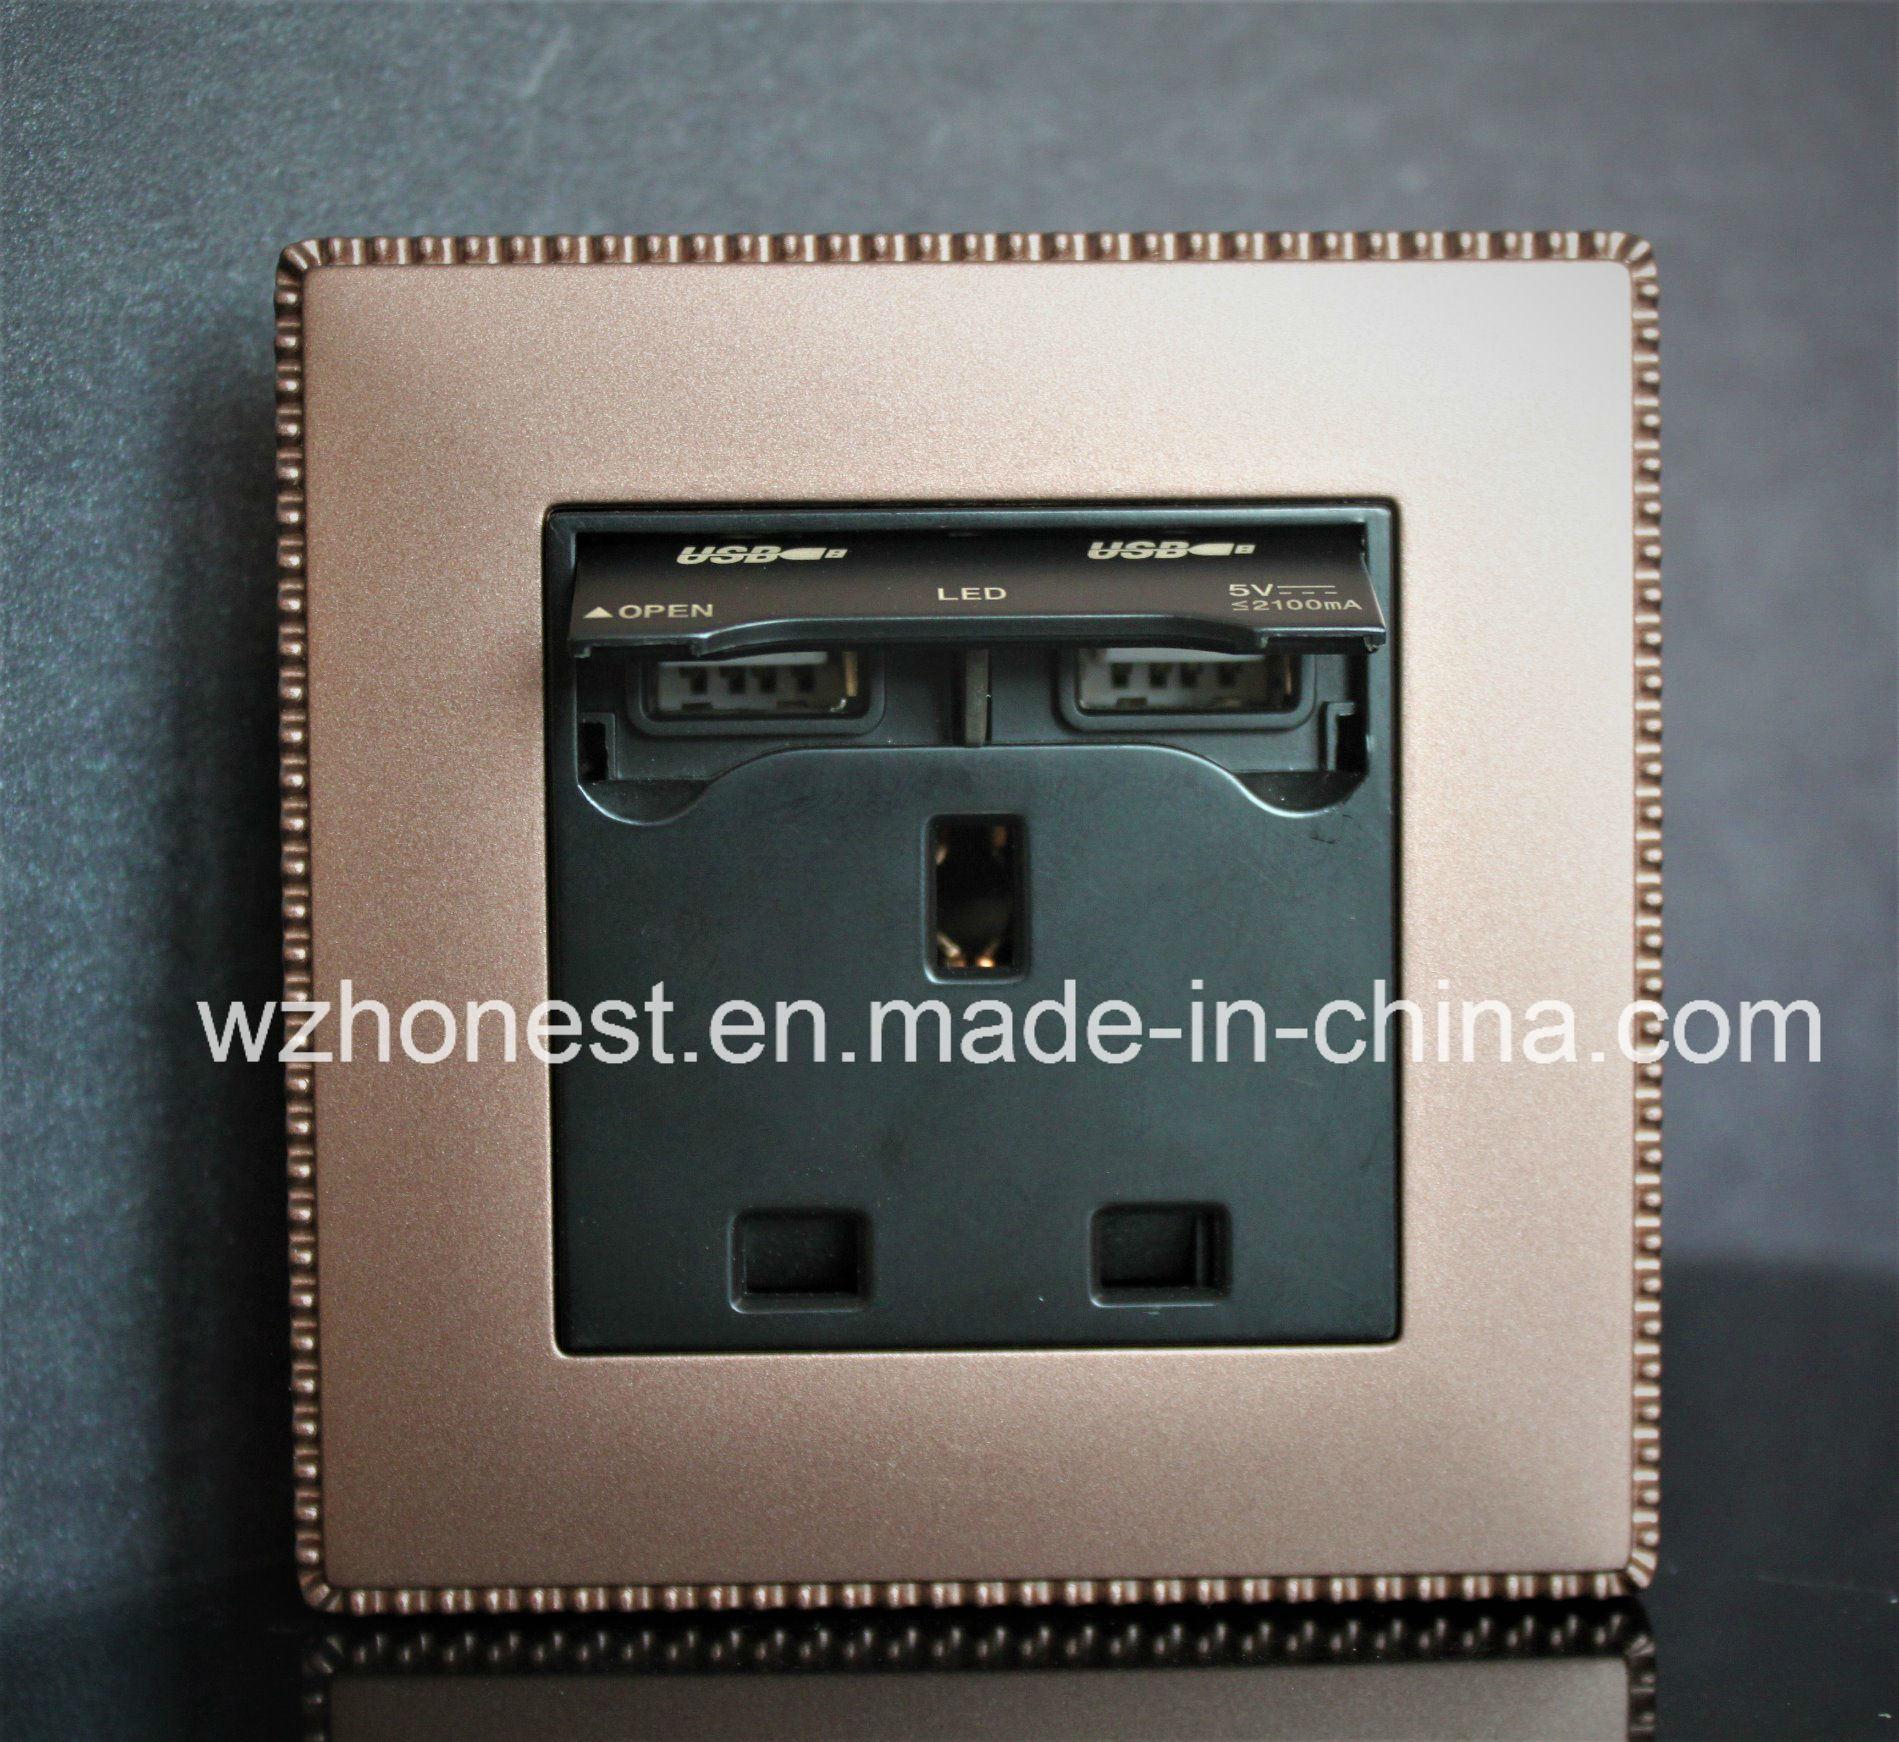 British 13A USB Socket with Double USB Charging Ports, 2100mA USB Port